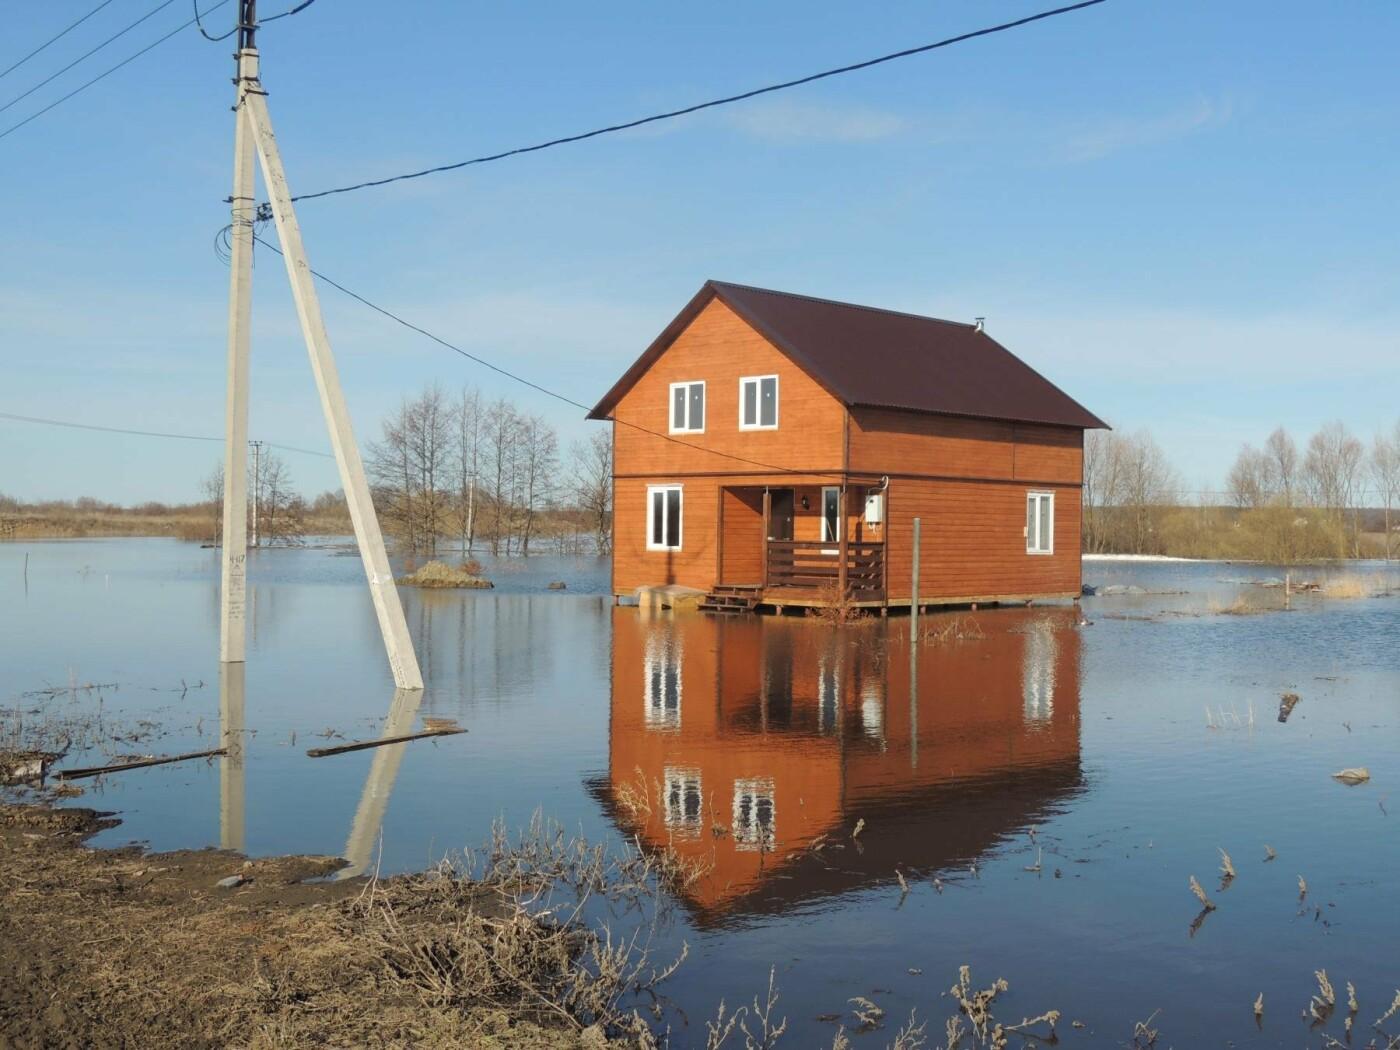 Тамбовские села отрезаны от внешнего мира паводком, фото-5